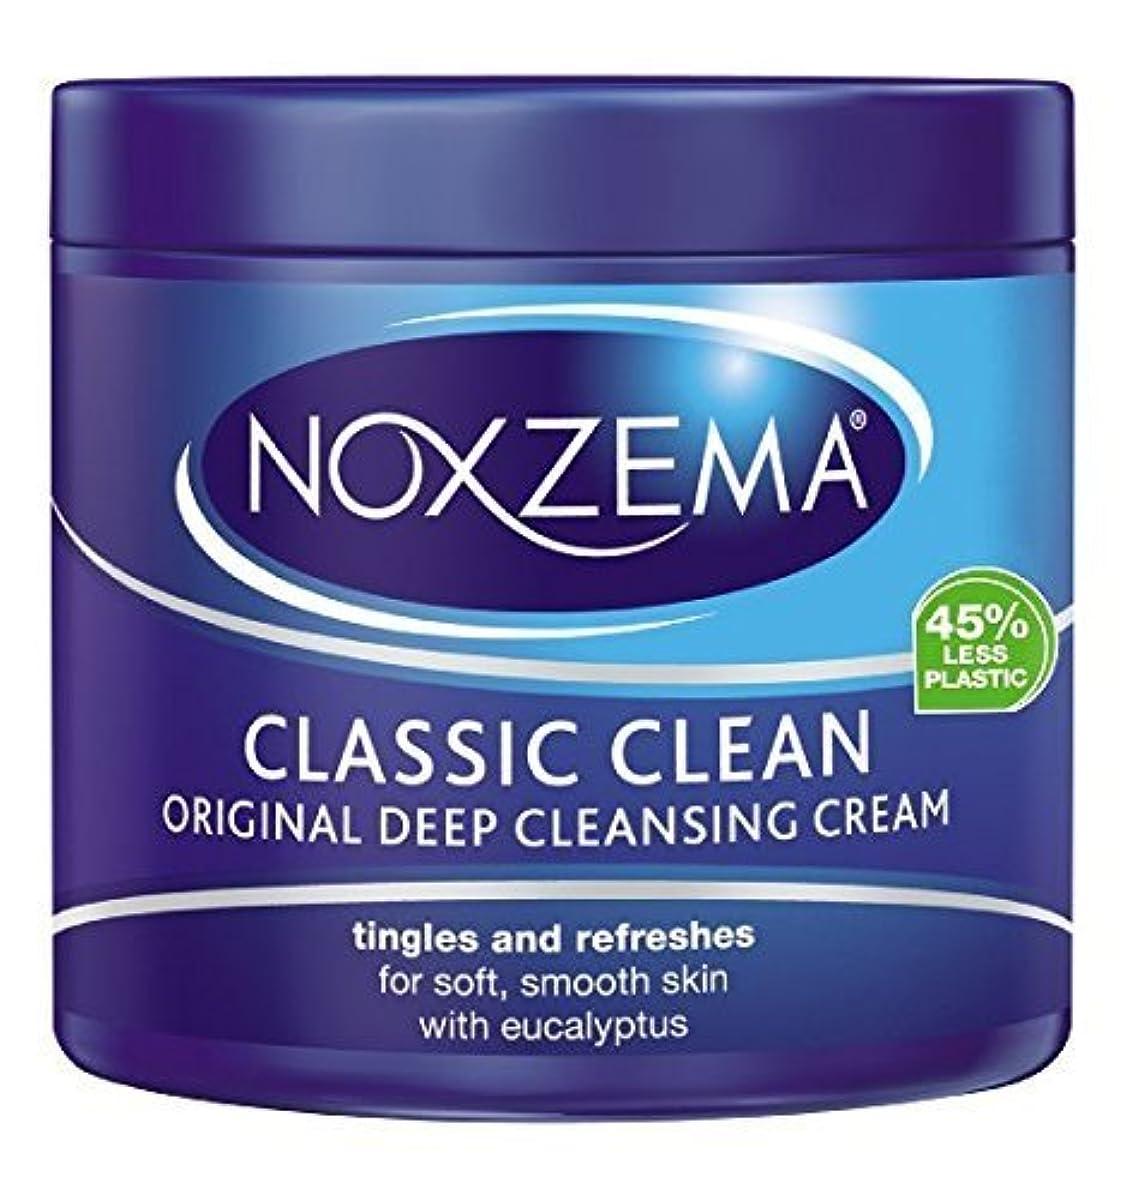 NOXZEMA ノグゼマ ディープ クレンジング クリーム 340g [並行輸入品]